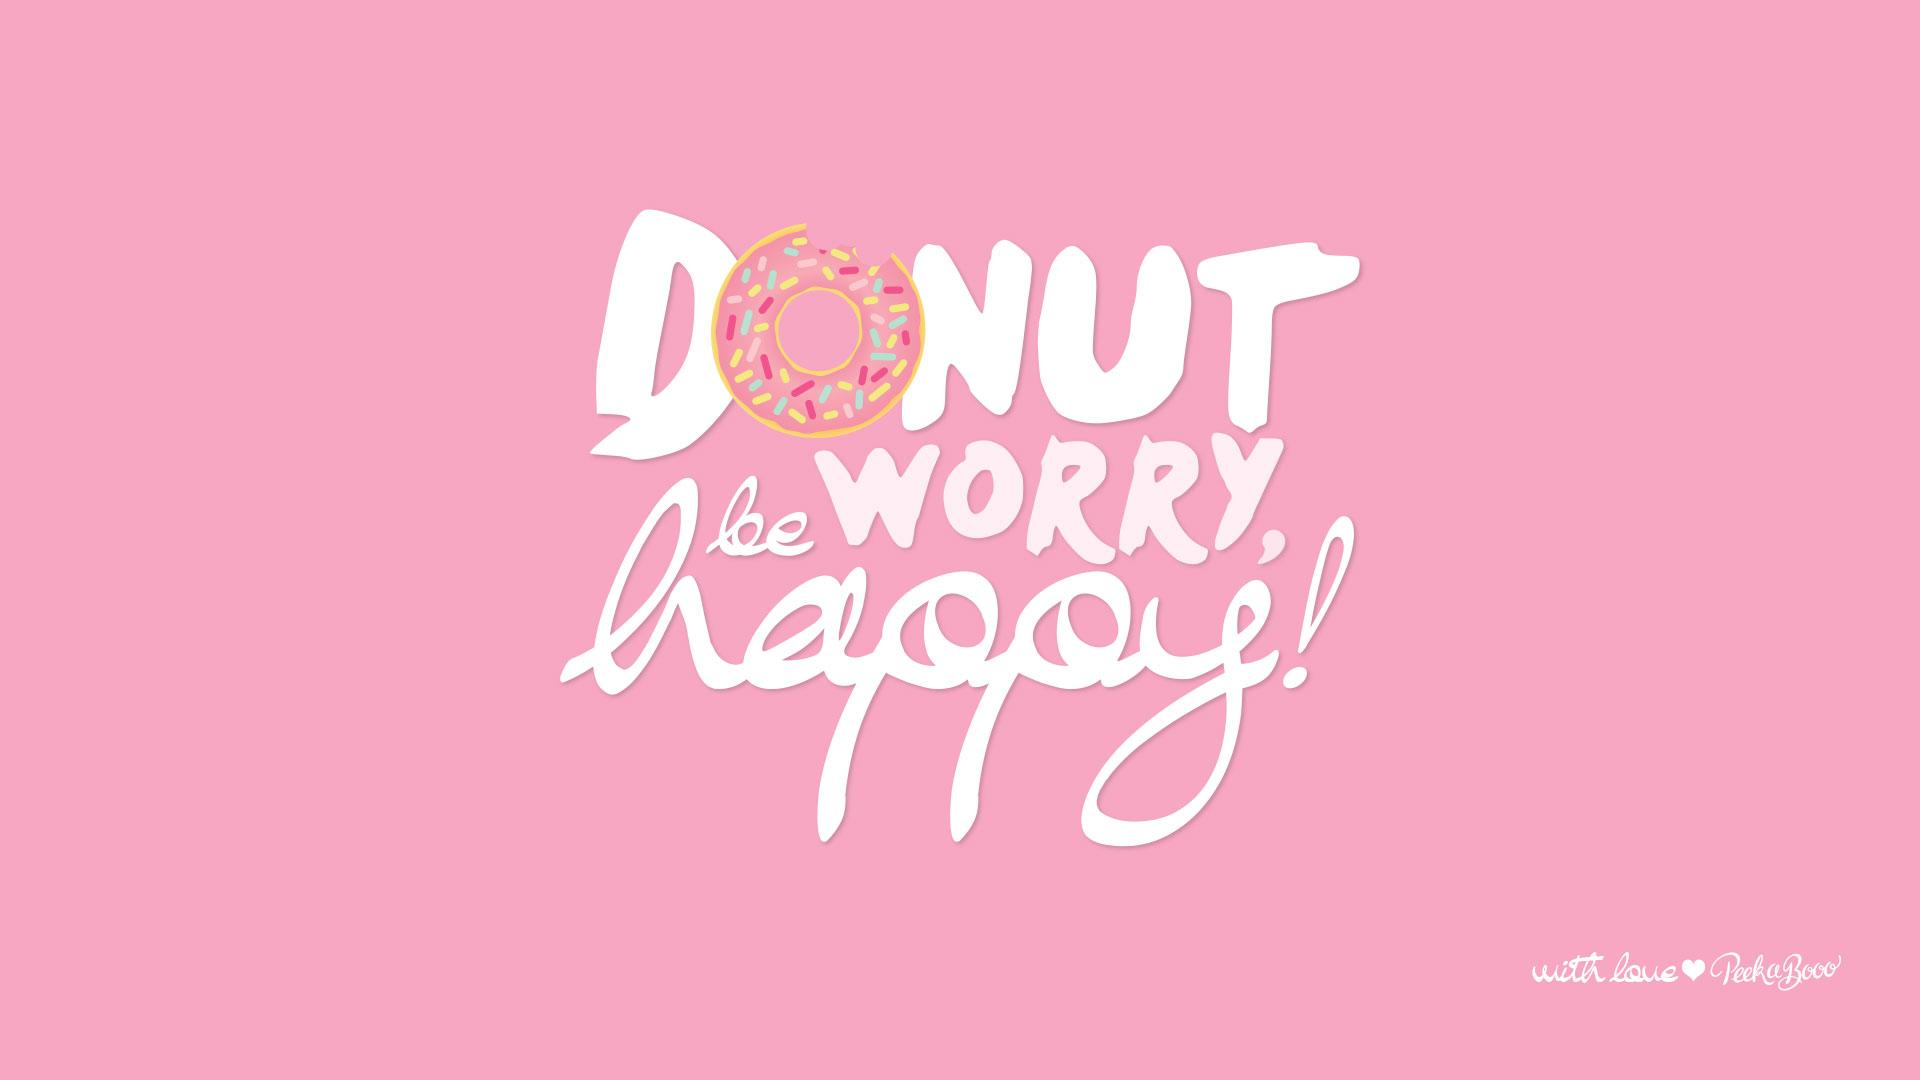 Nouveau Fond D Ecran Donut Worry Be Happy Peek A Booo